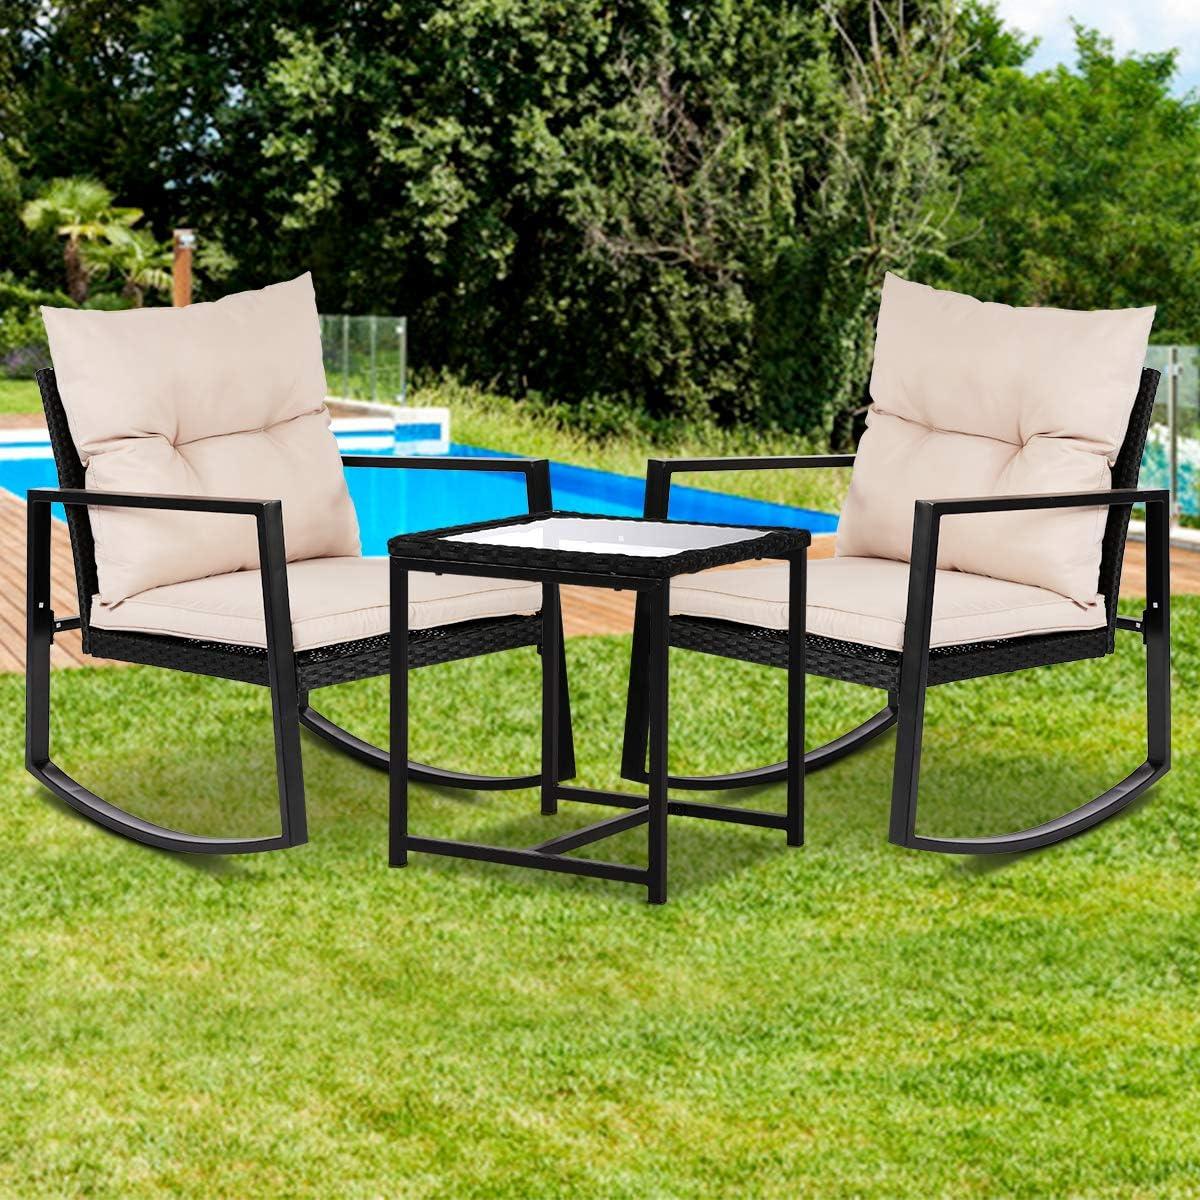 Outdoor 3Piece Max 75% OFF Bistro Set Rocking C New color Rattan Chair Patio